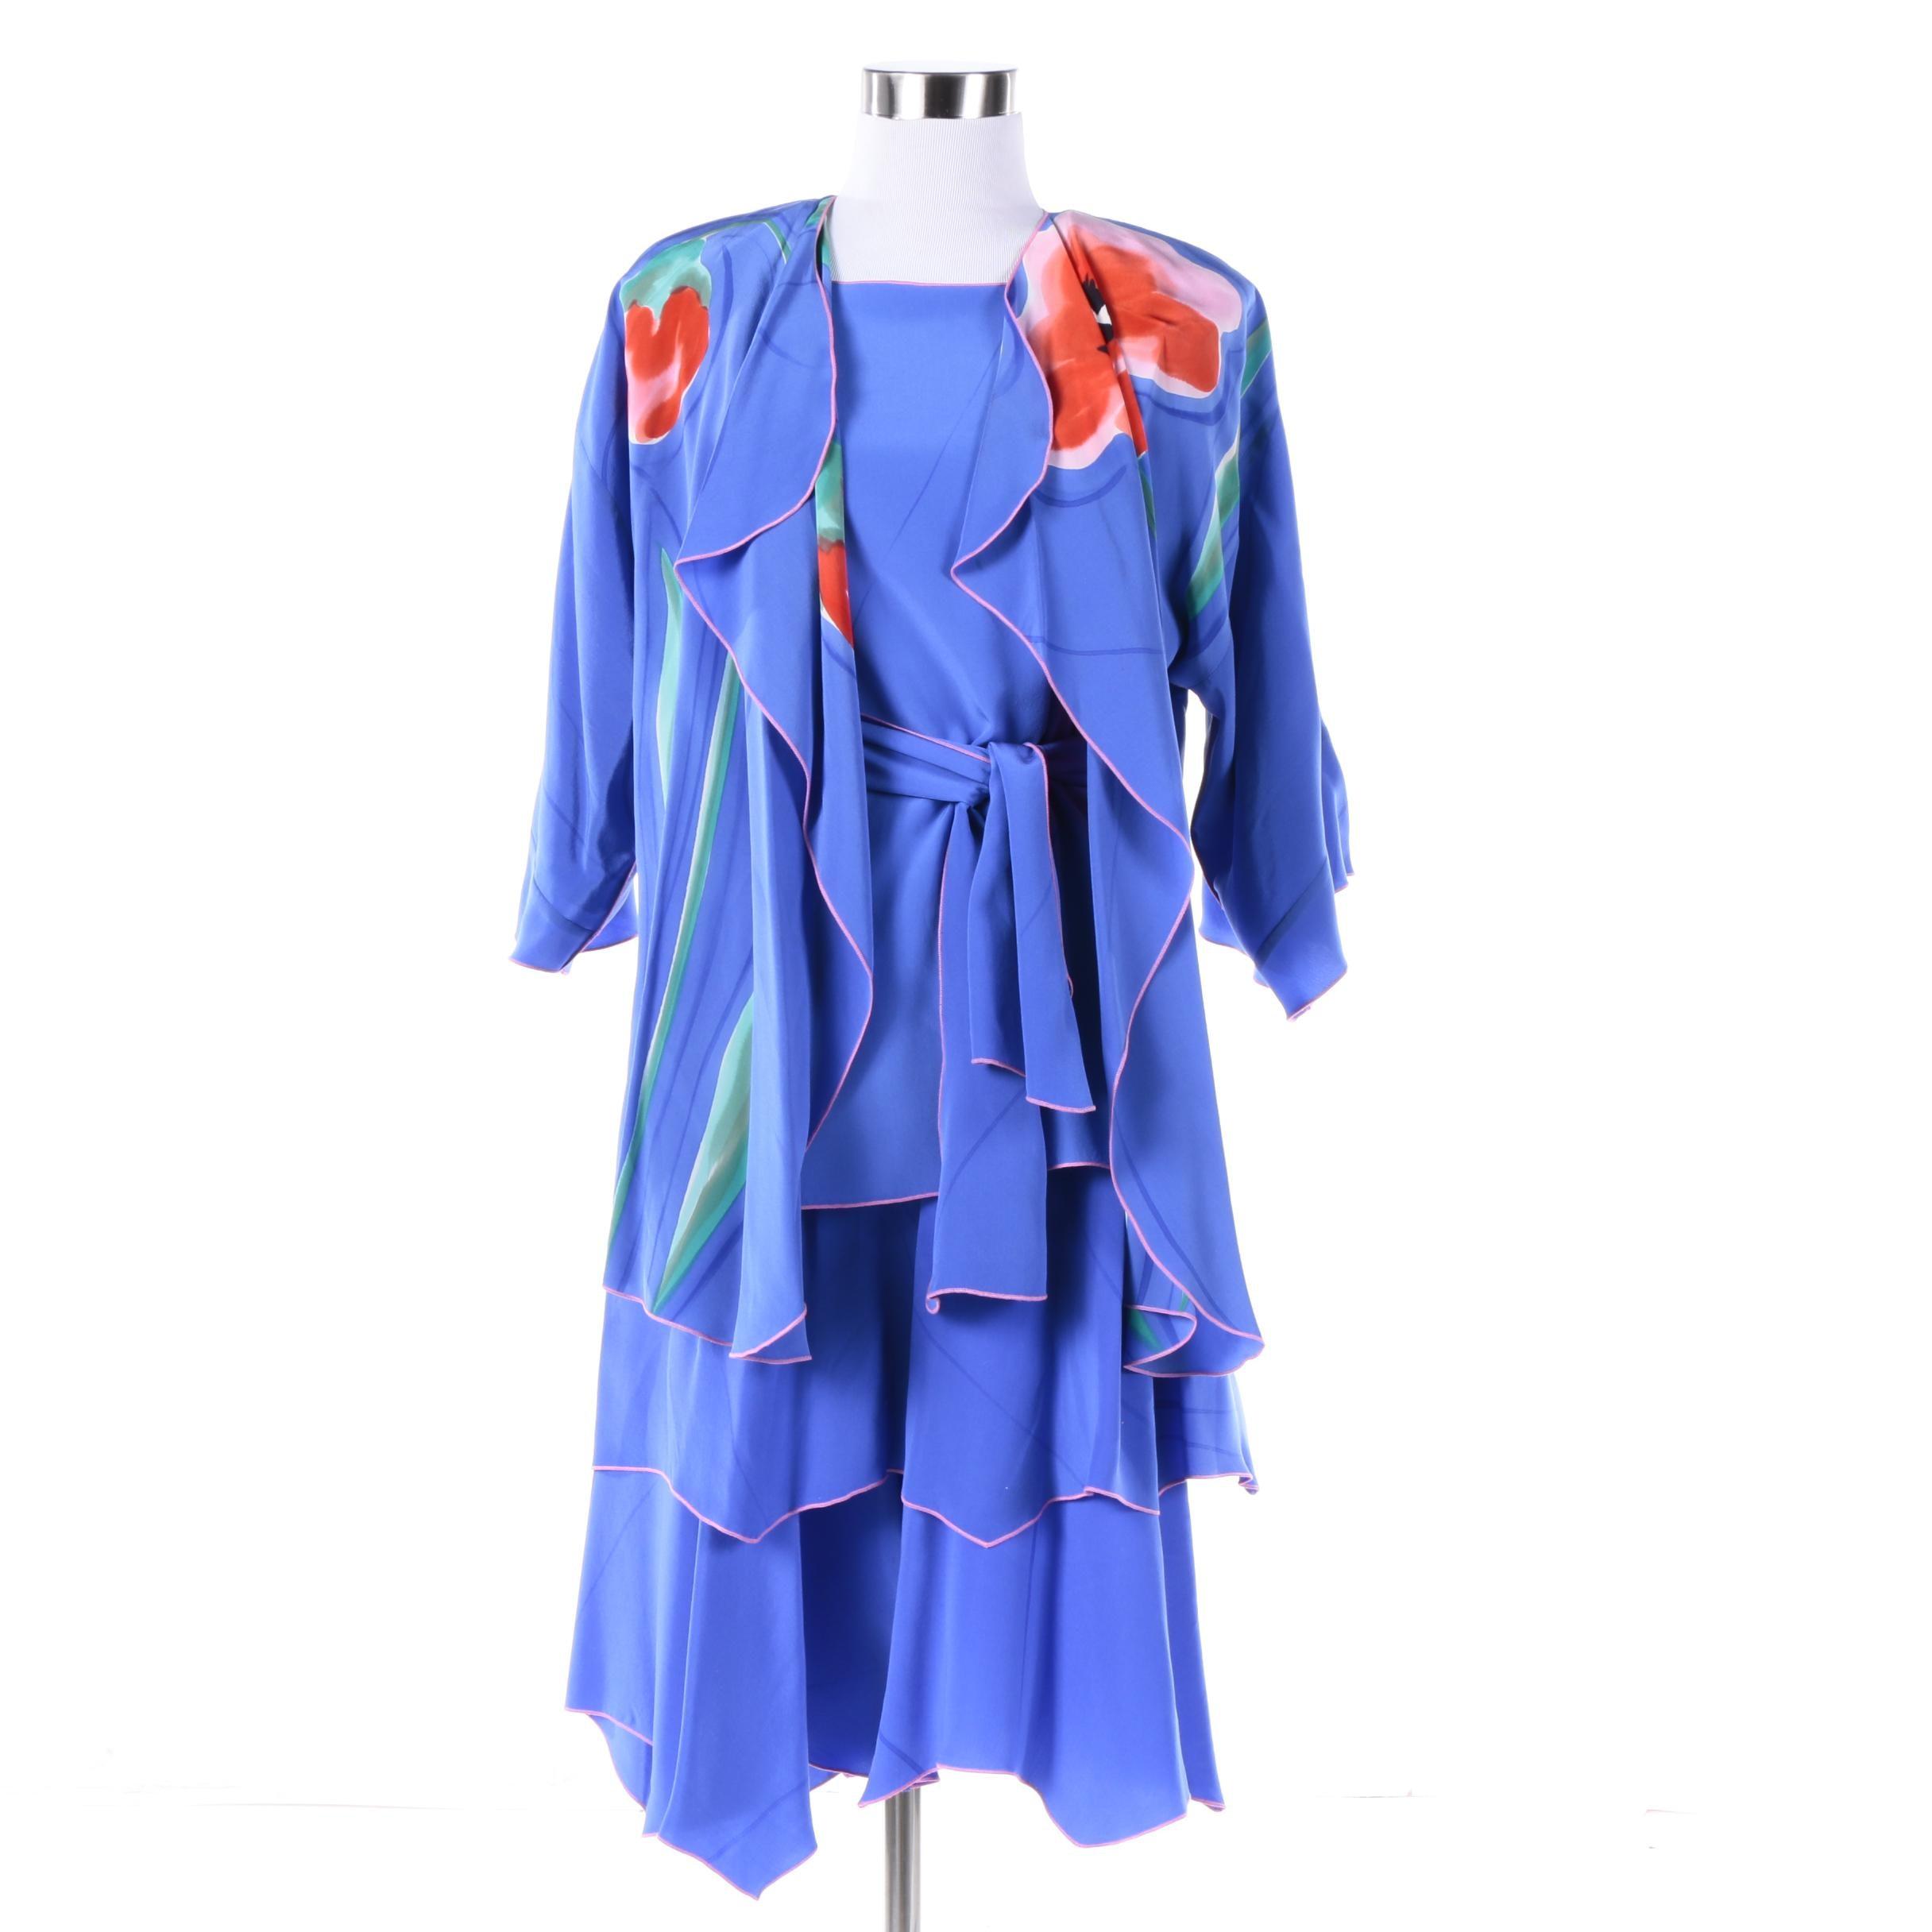 Yolanda Lorente Hand-Painted Floral Silk Three-Piece Ensemble